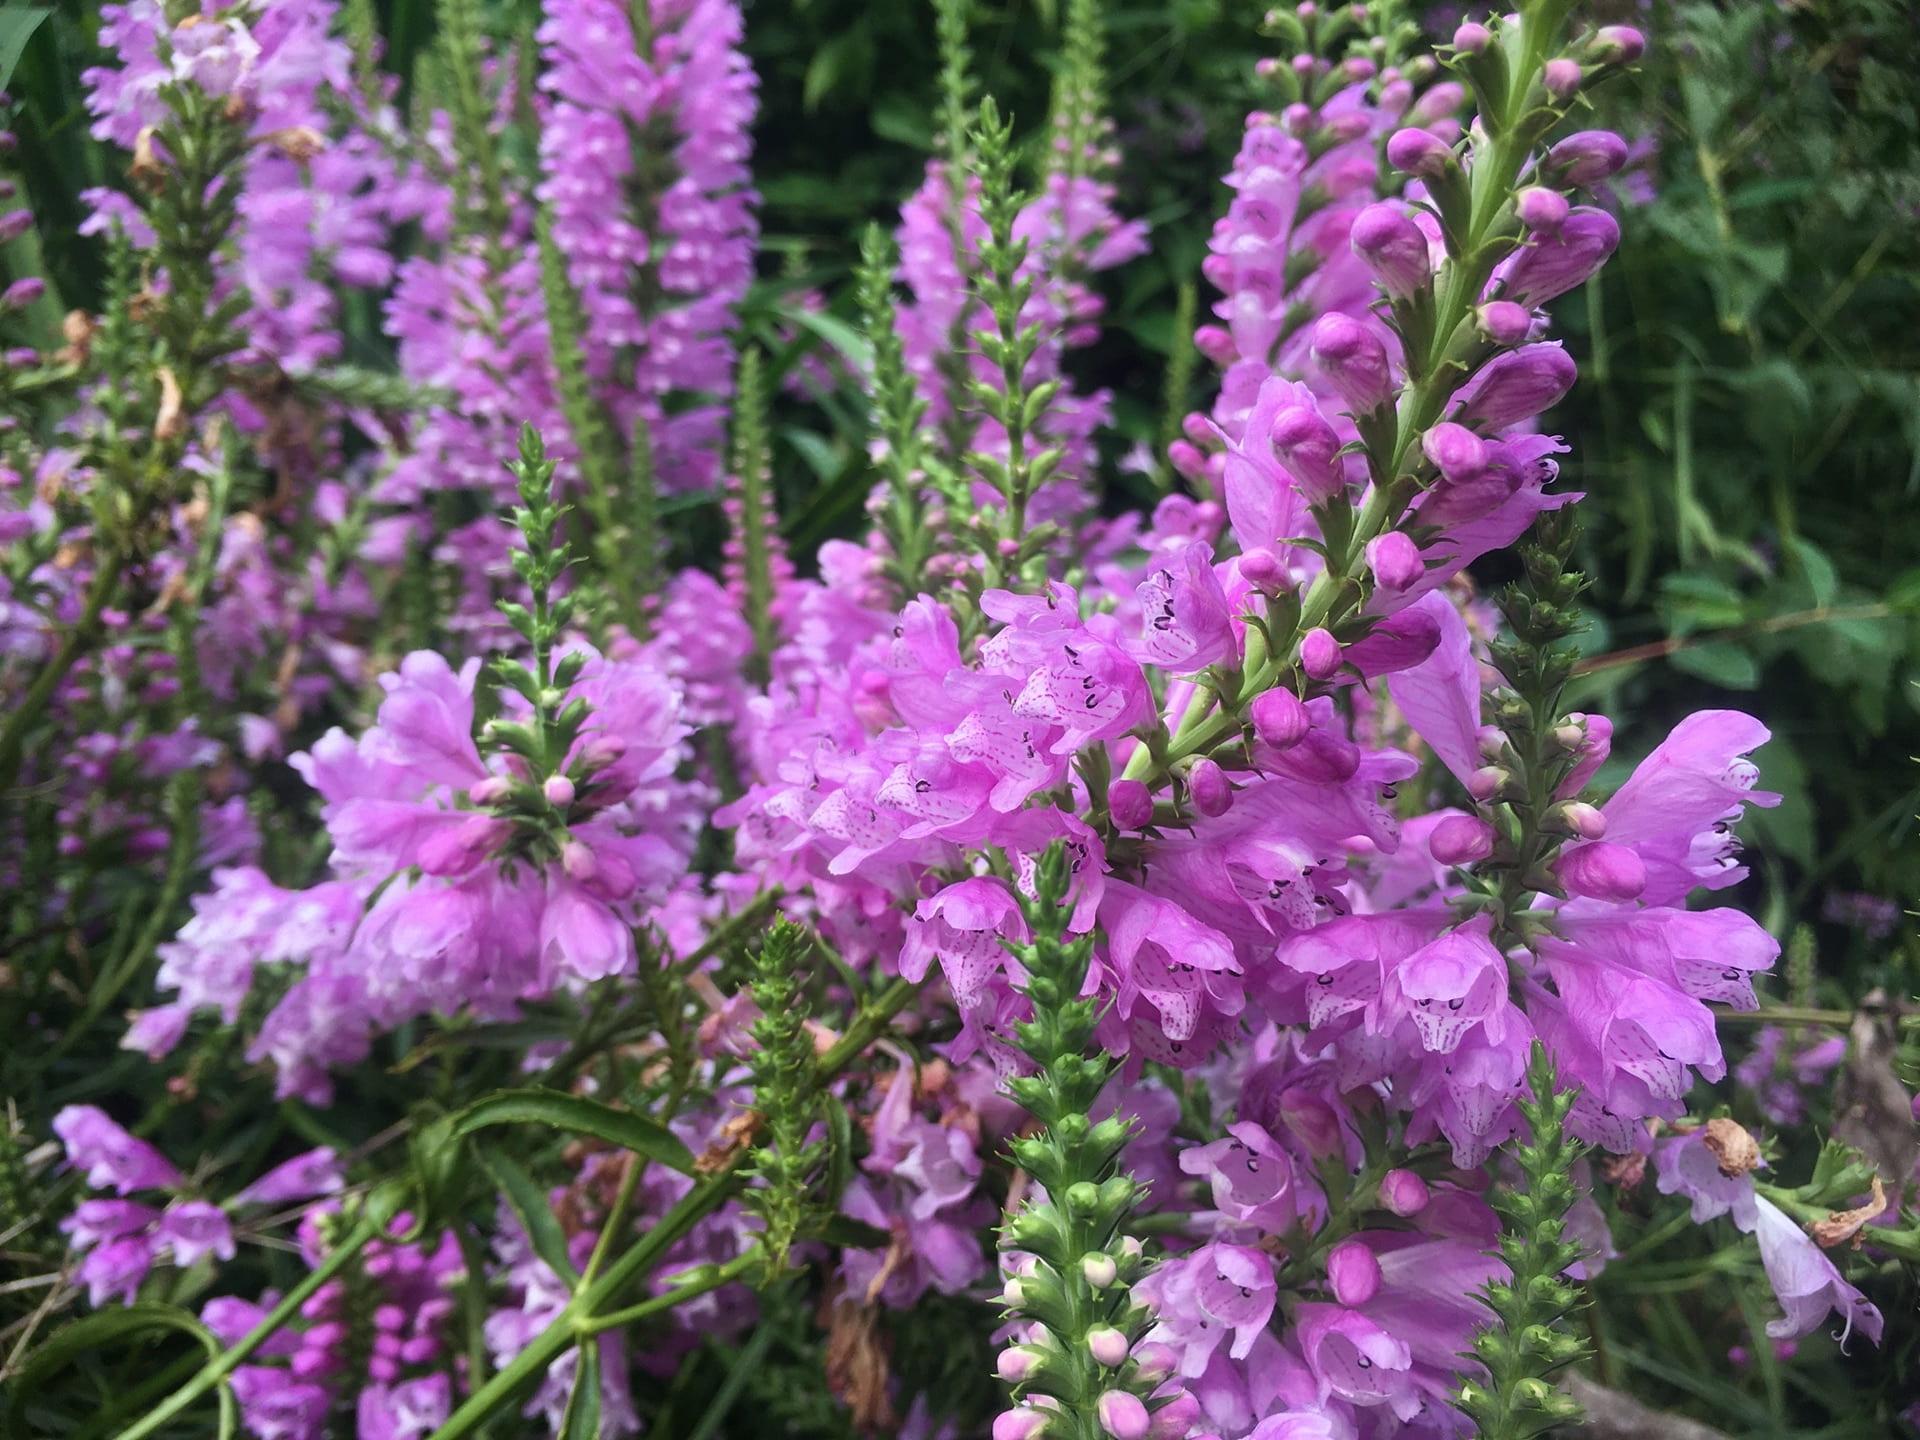 The vivid flowers of Physostegia virginiana thrives in the moist soils of our rain garden.